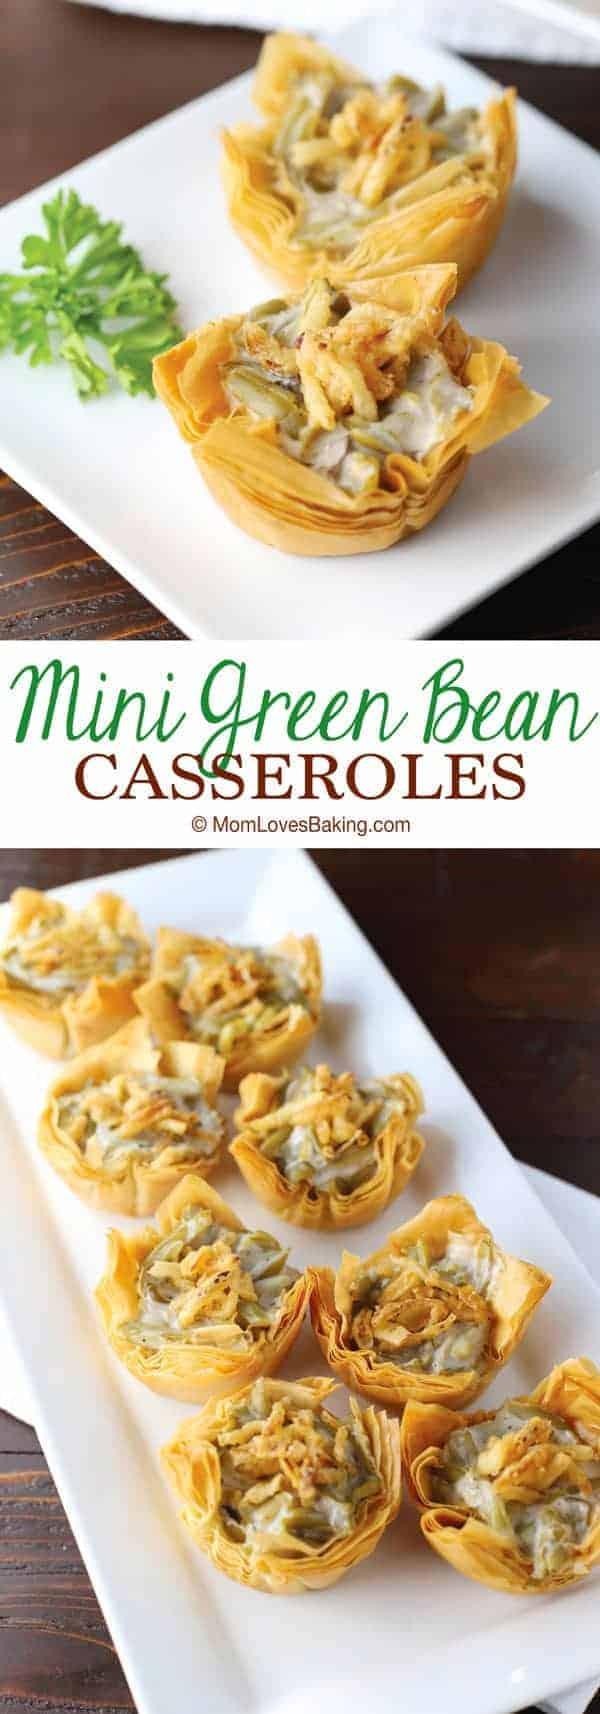 Mini Green Bean Casseroles